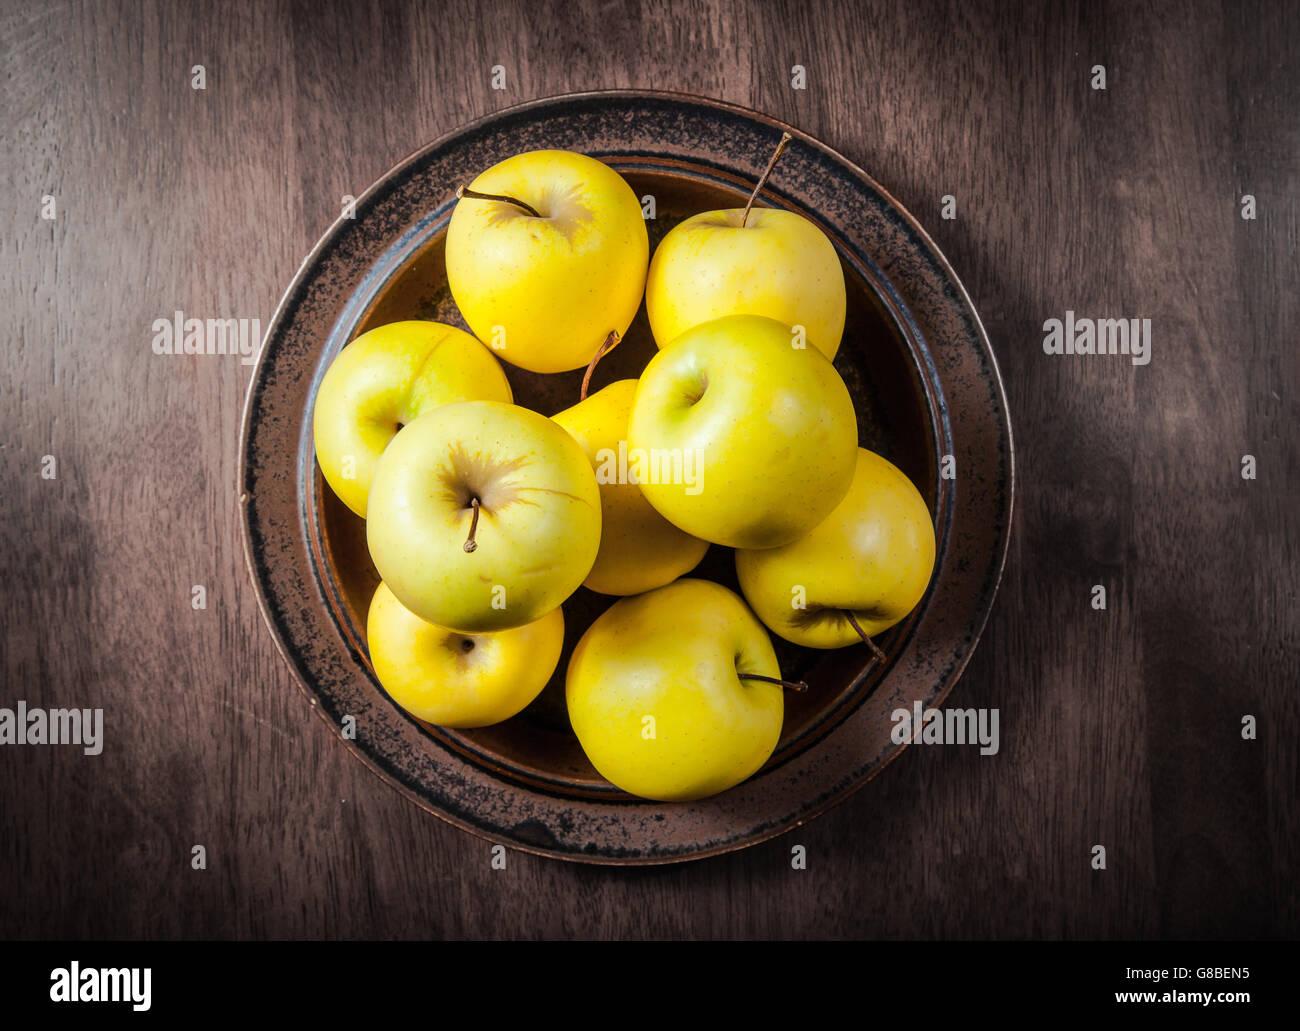 Raw Organic Golden Delicious Apples - Stock Image